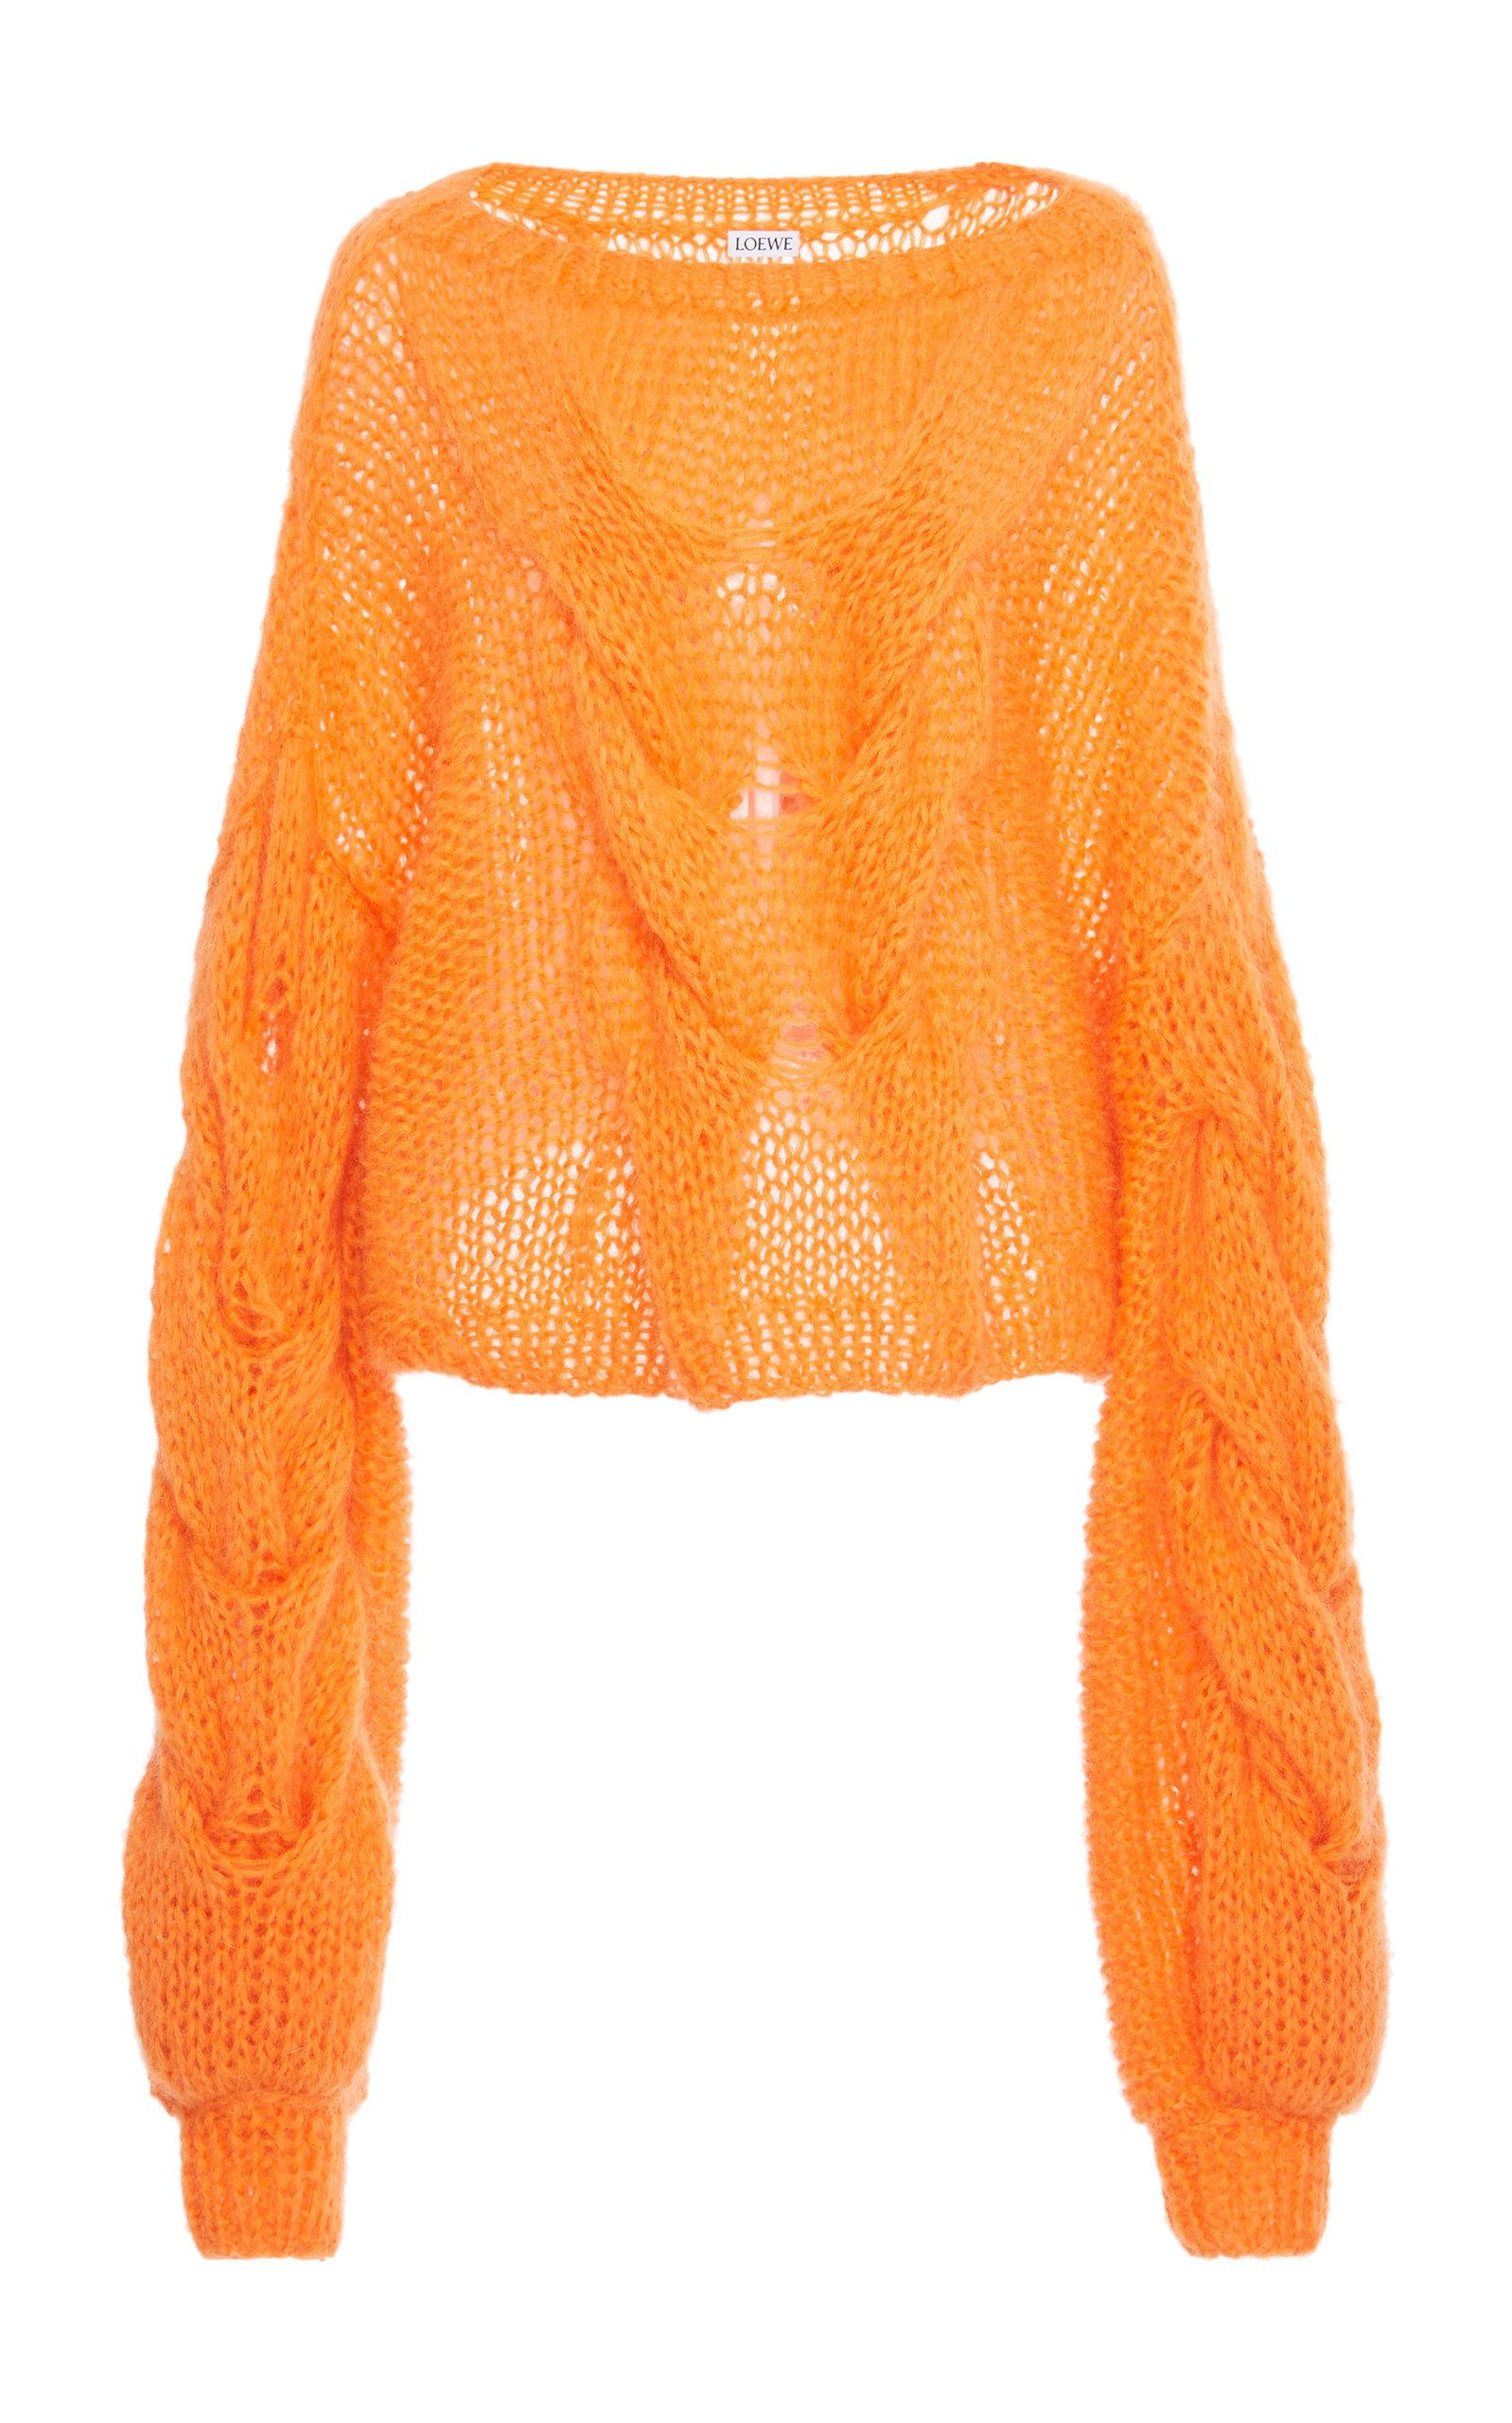 8caf6414761 Loewe Cable Mohair-Blend Sweater In Orange. Moda Operandi